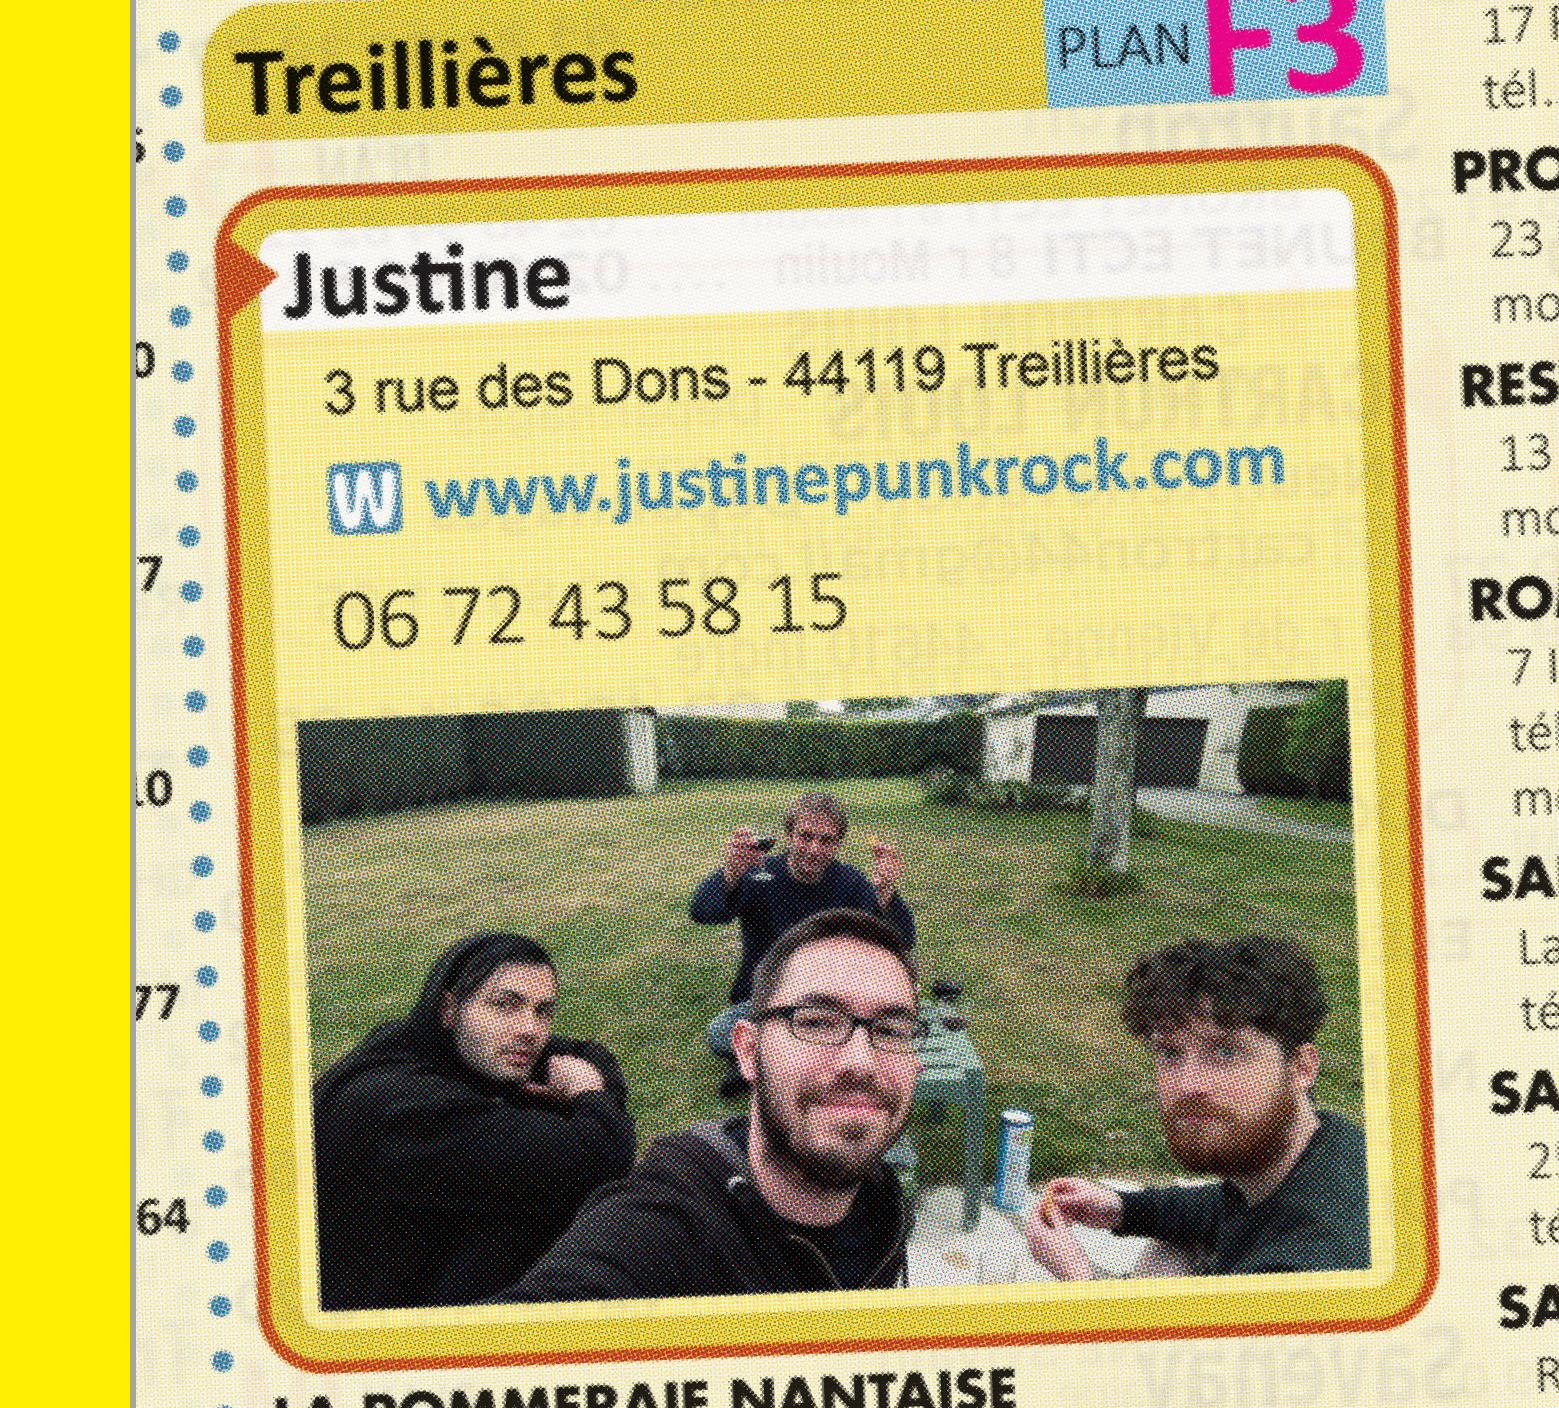 Justine - 06 72 43 58 15